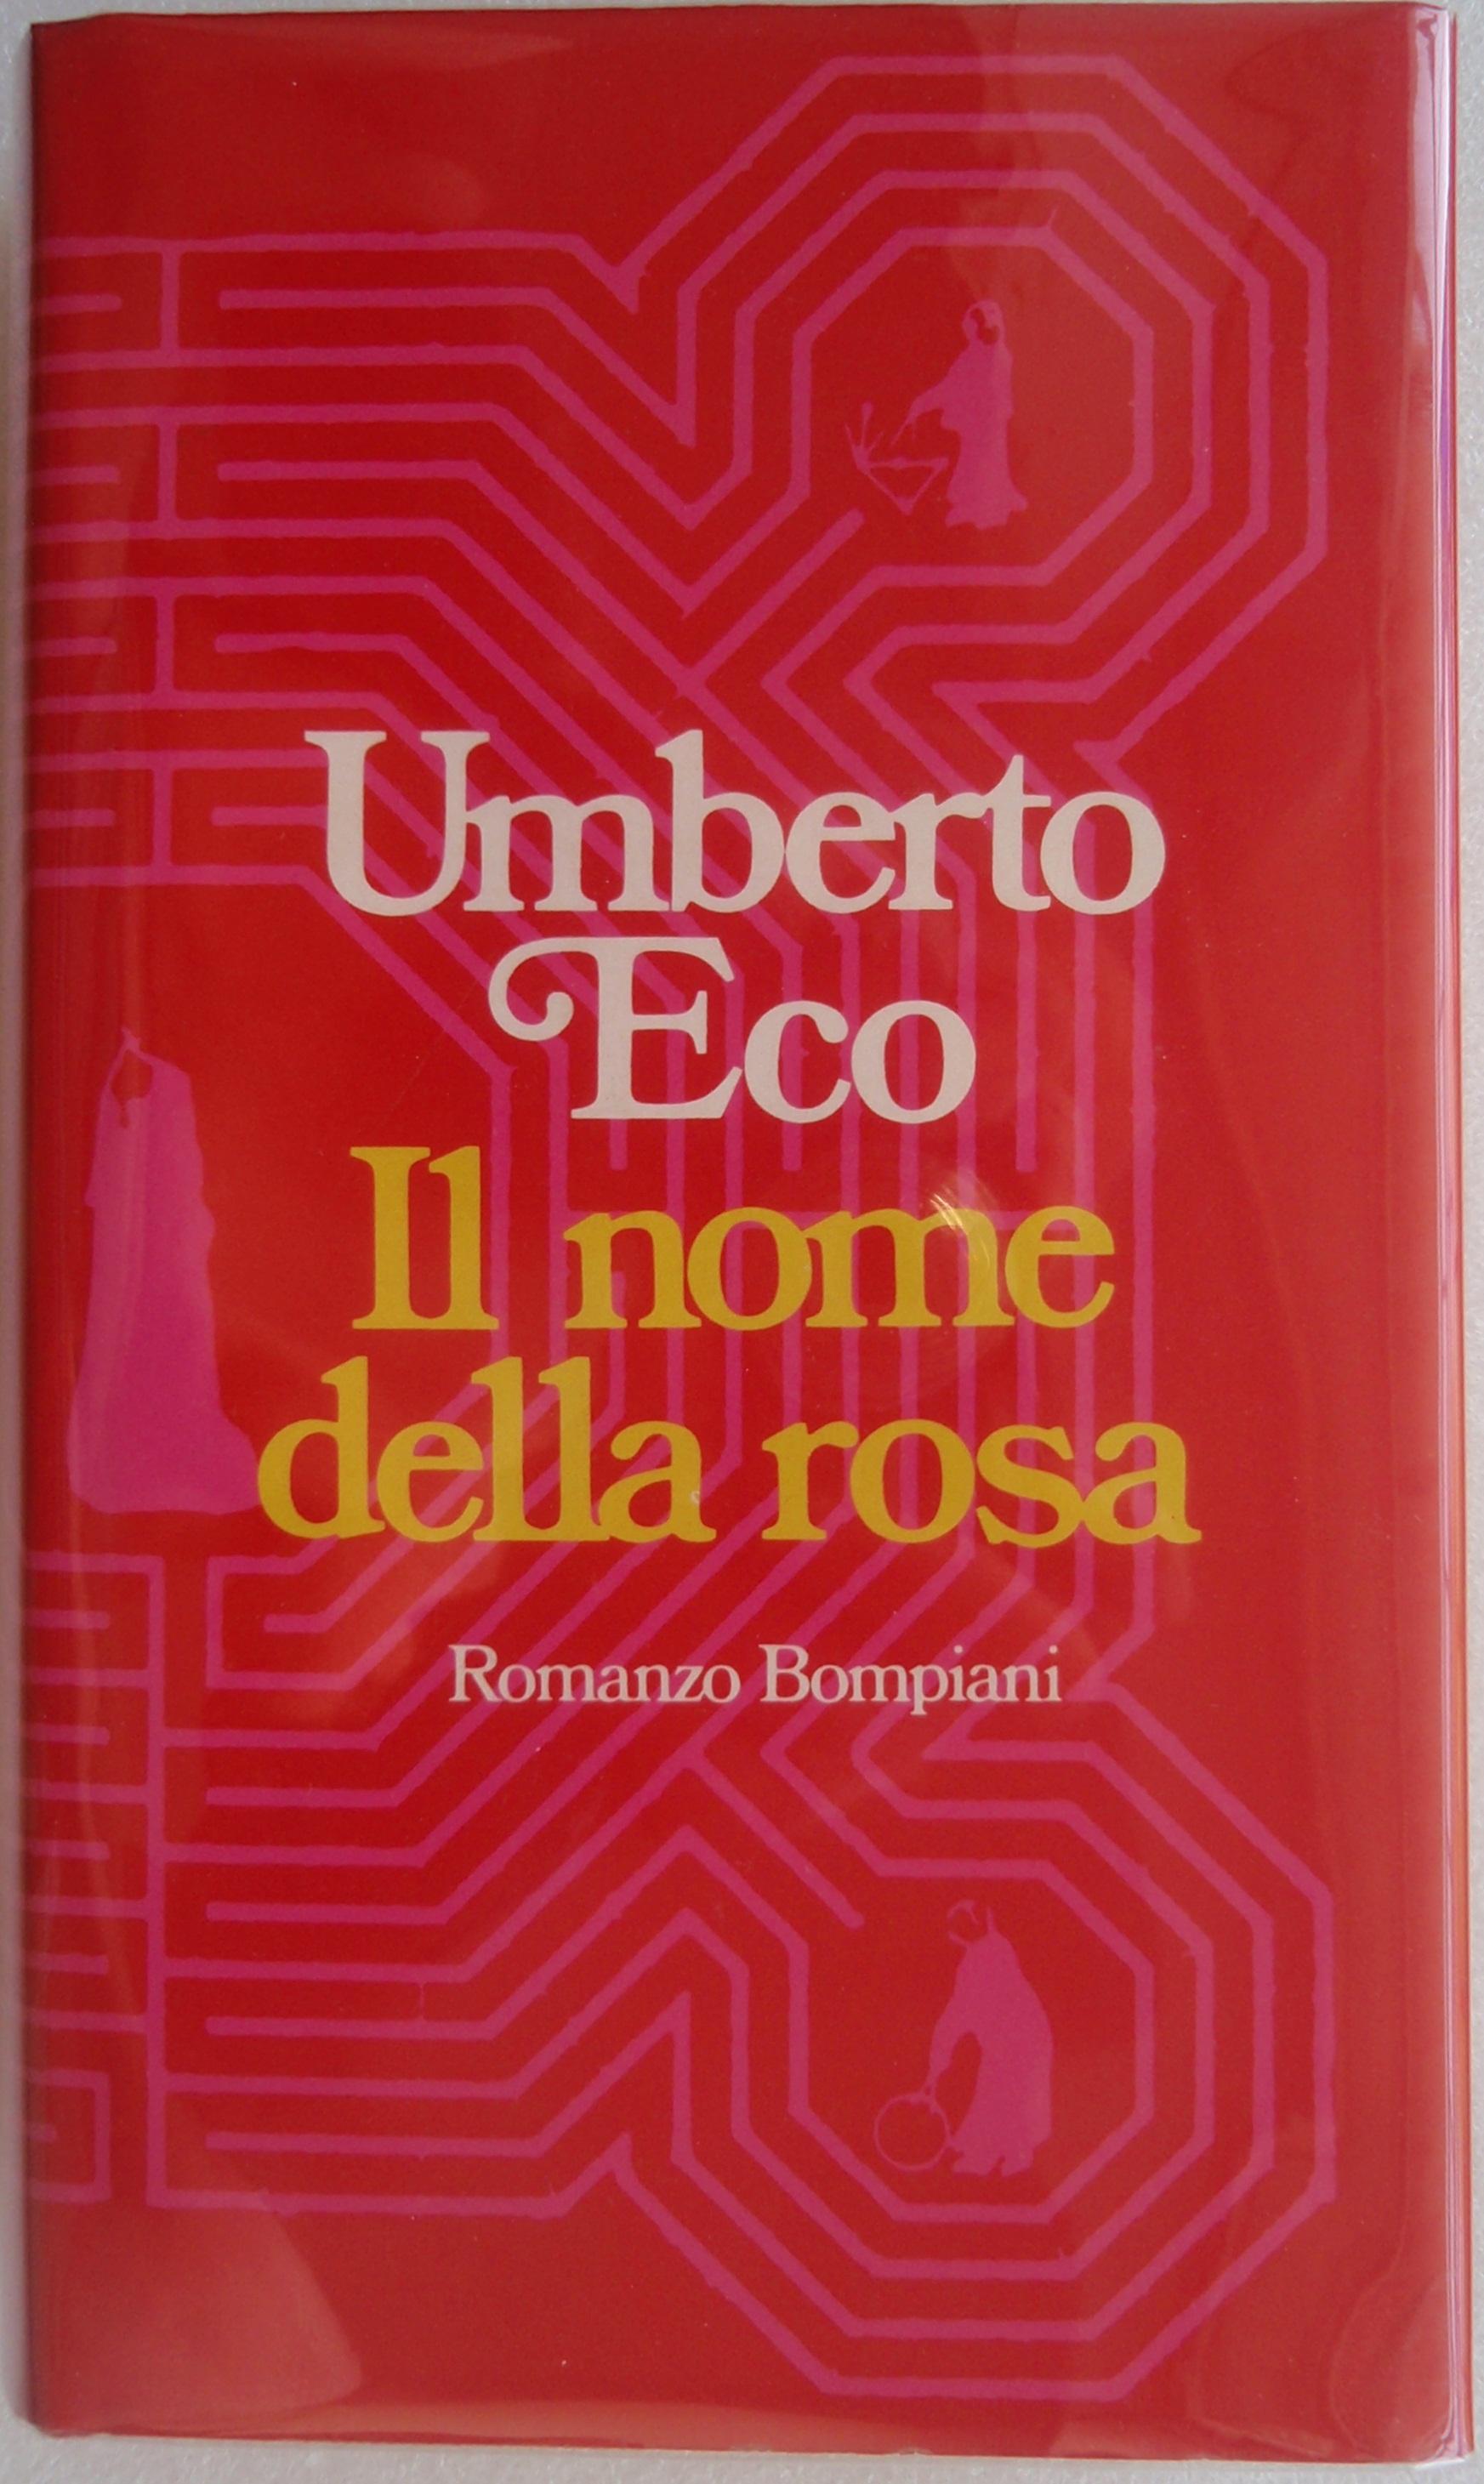 Umberto_Ecos_famous_first_novel_Il_Nome_della_Rosa_(Bompianis_copy_No._9069)._The_book_...